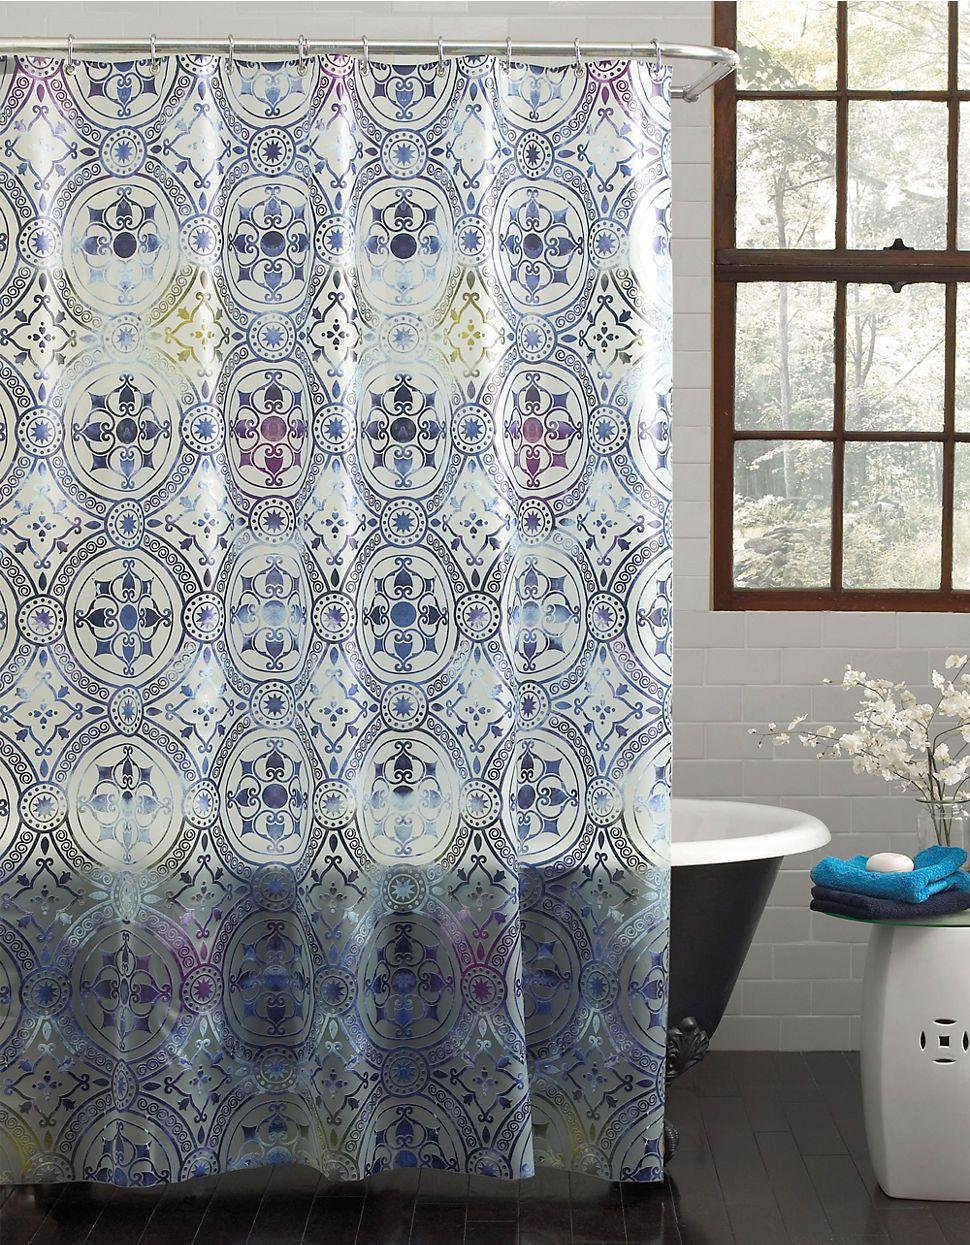 http://www.thebay.com/webapp/wcs/stores/servlet/en/thebay/home/bath-shower-curtains/insignia-shower-curtain-0339-87185248--24